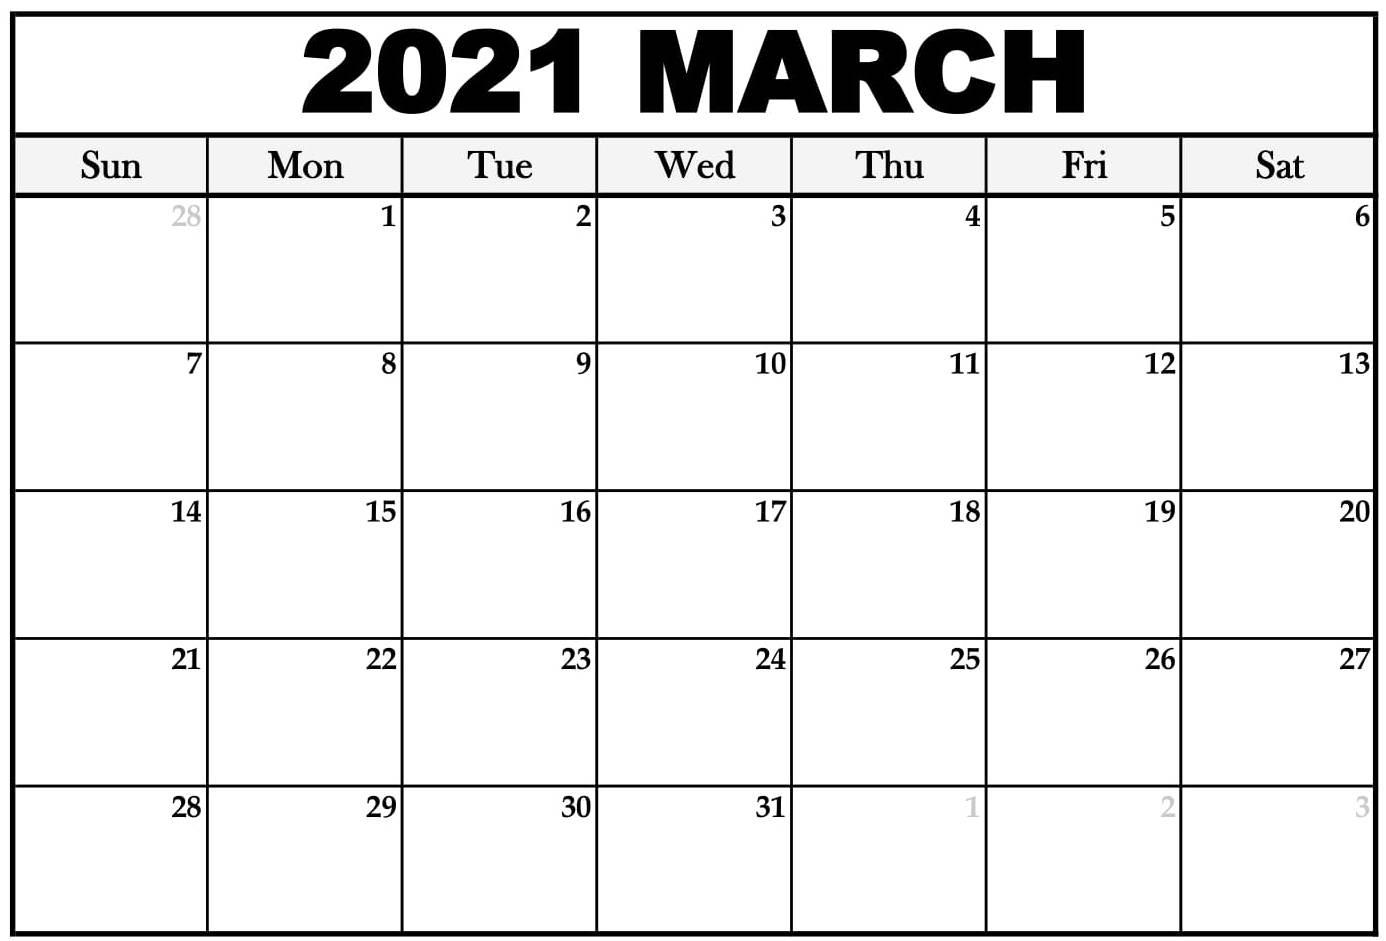 Printable March 2021 Calendar Usa Holidays - Printable within March Holidays 2021 Calendars